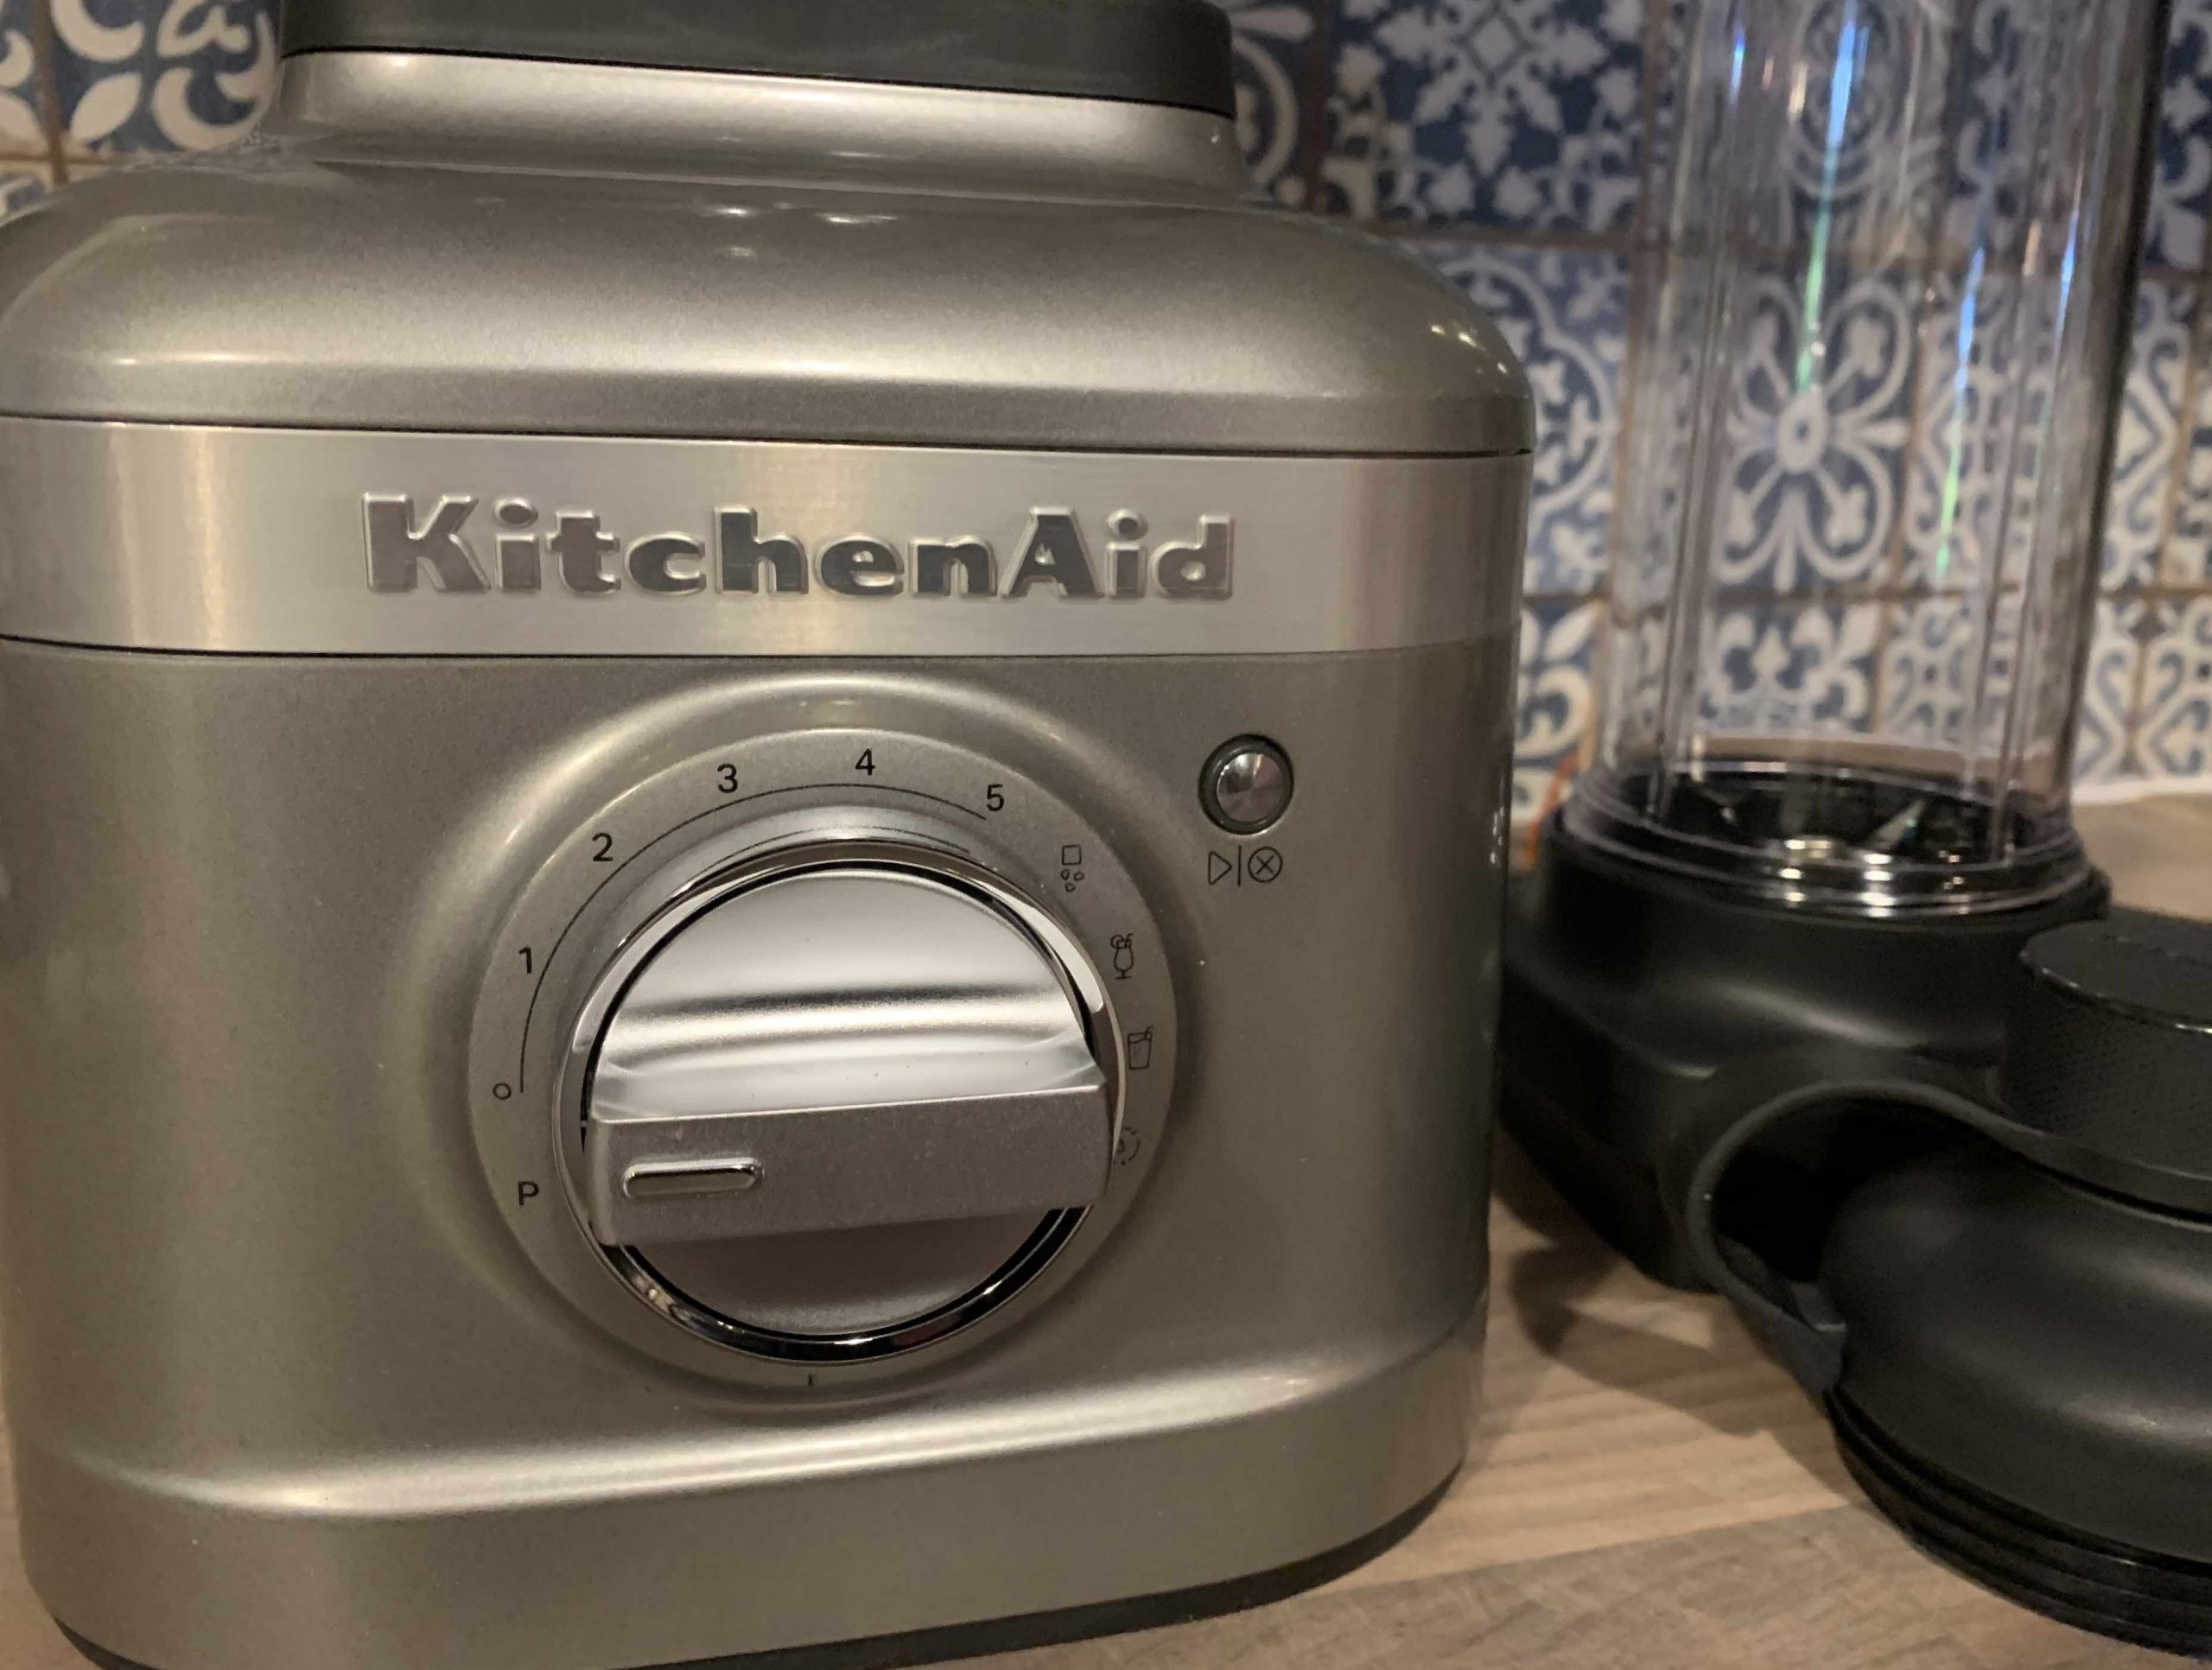 KitchenAid K400 Blender